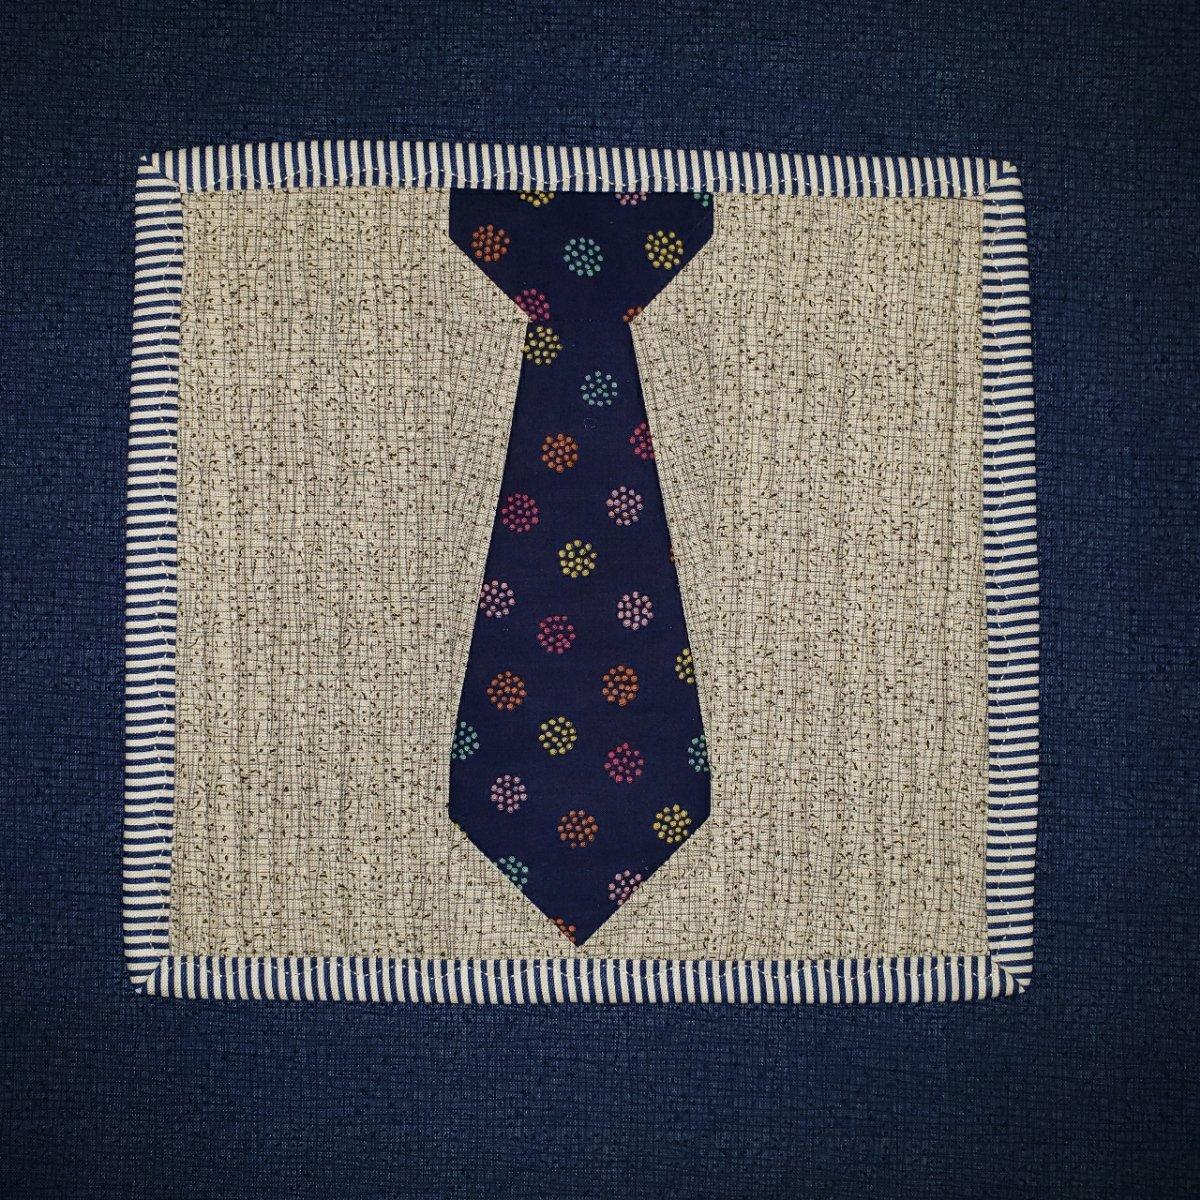 Necktie Mug Rug June 2021